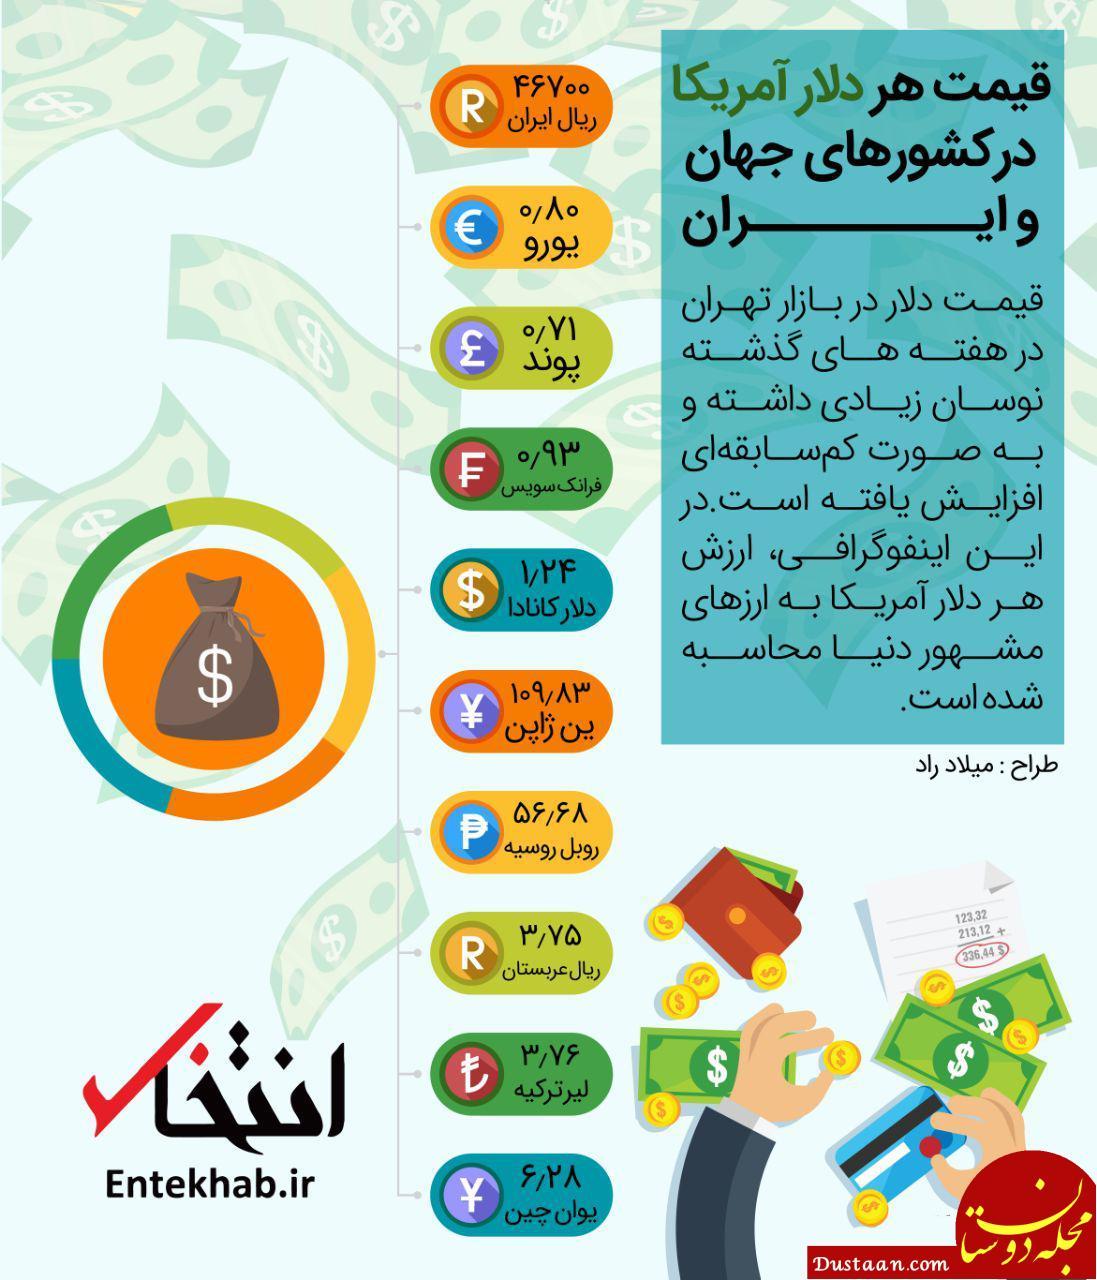 www.dustaan.com قیمت هر دلار آمریکا در کشورهای جهان و ایران +اینفوگرافیک